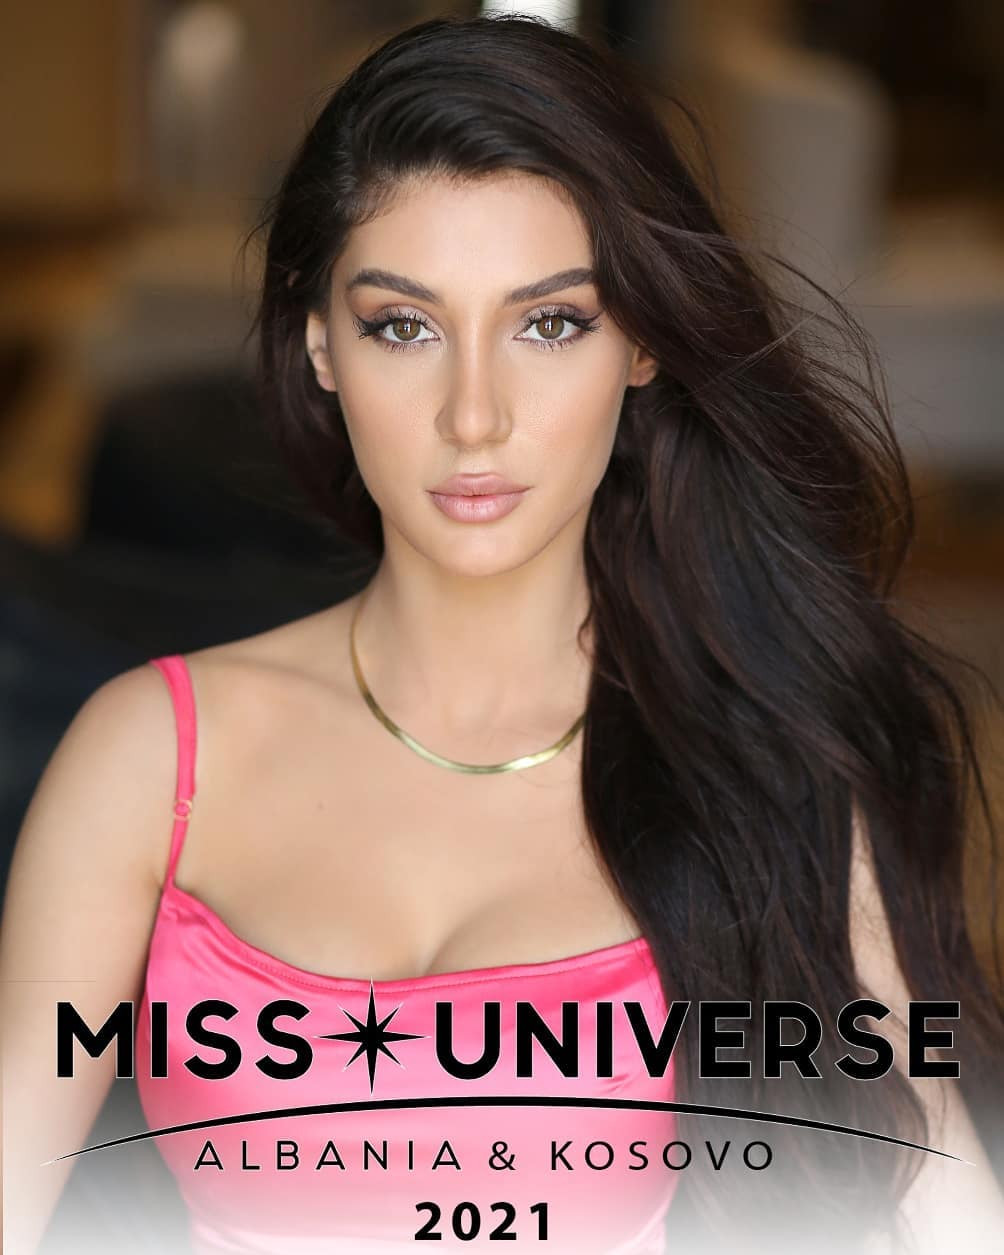 candidatas a miss universe albania 2021. final: 9 july. - Página 2 Oxw2zN